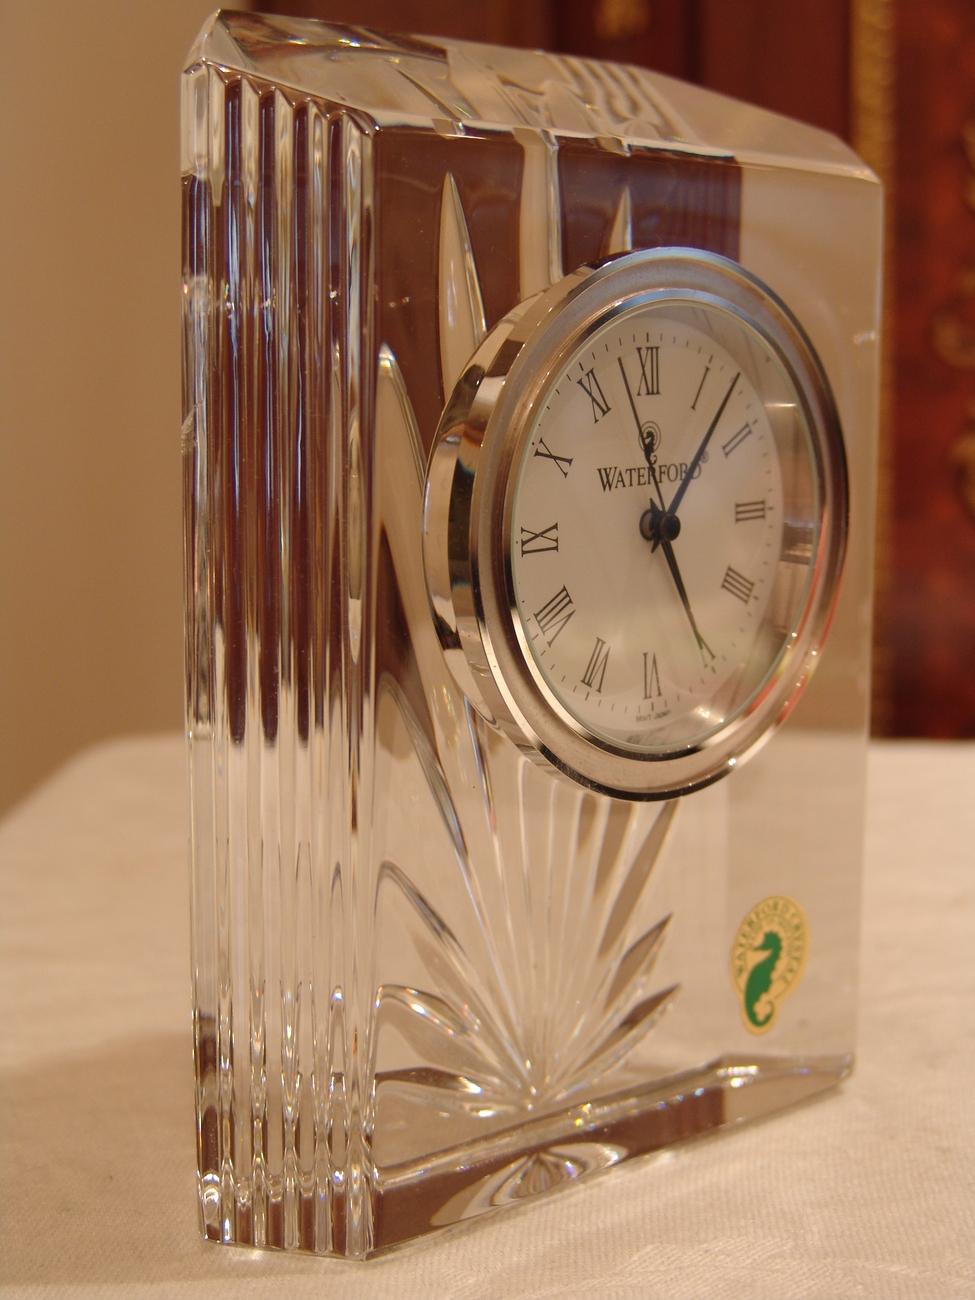 WATERFORD CRYSTAL COLONNADE CLOCK